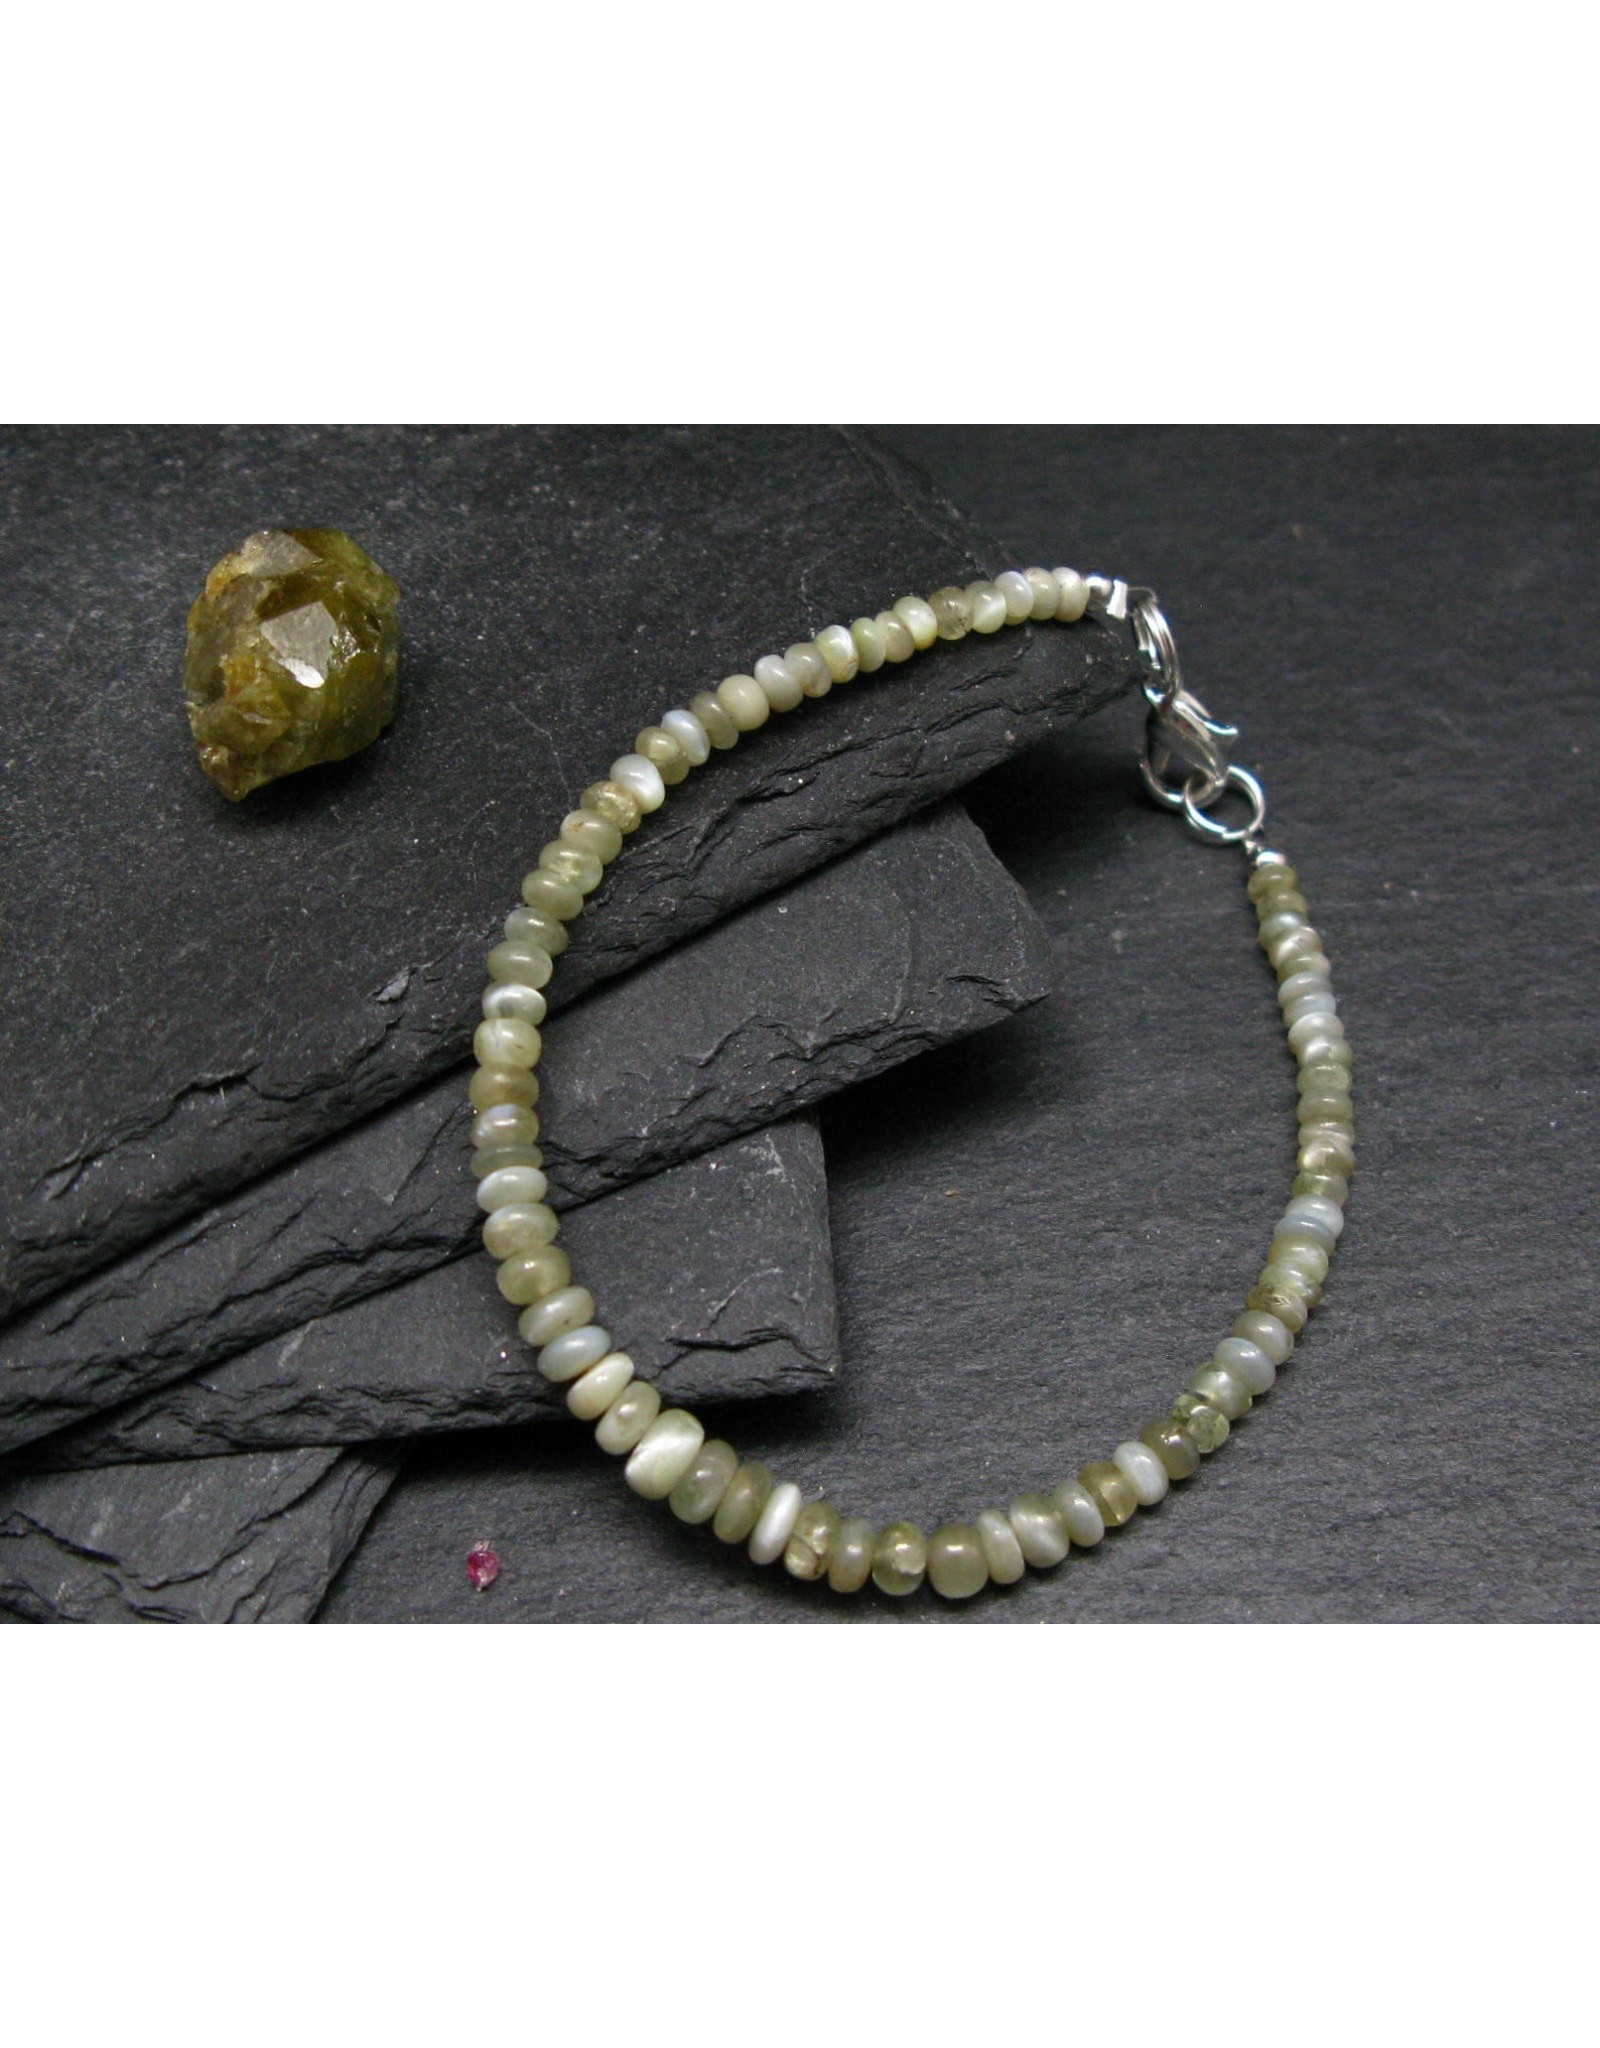 Chrysoberyl Cats Eye Bracelet - 4.5mm Rondelle Beads